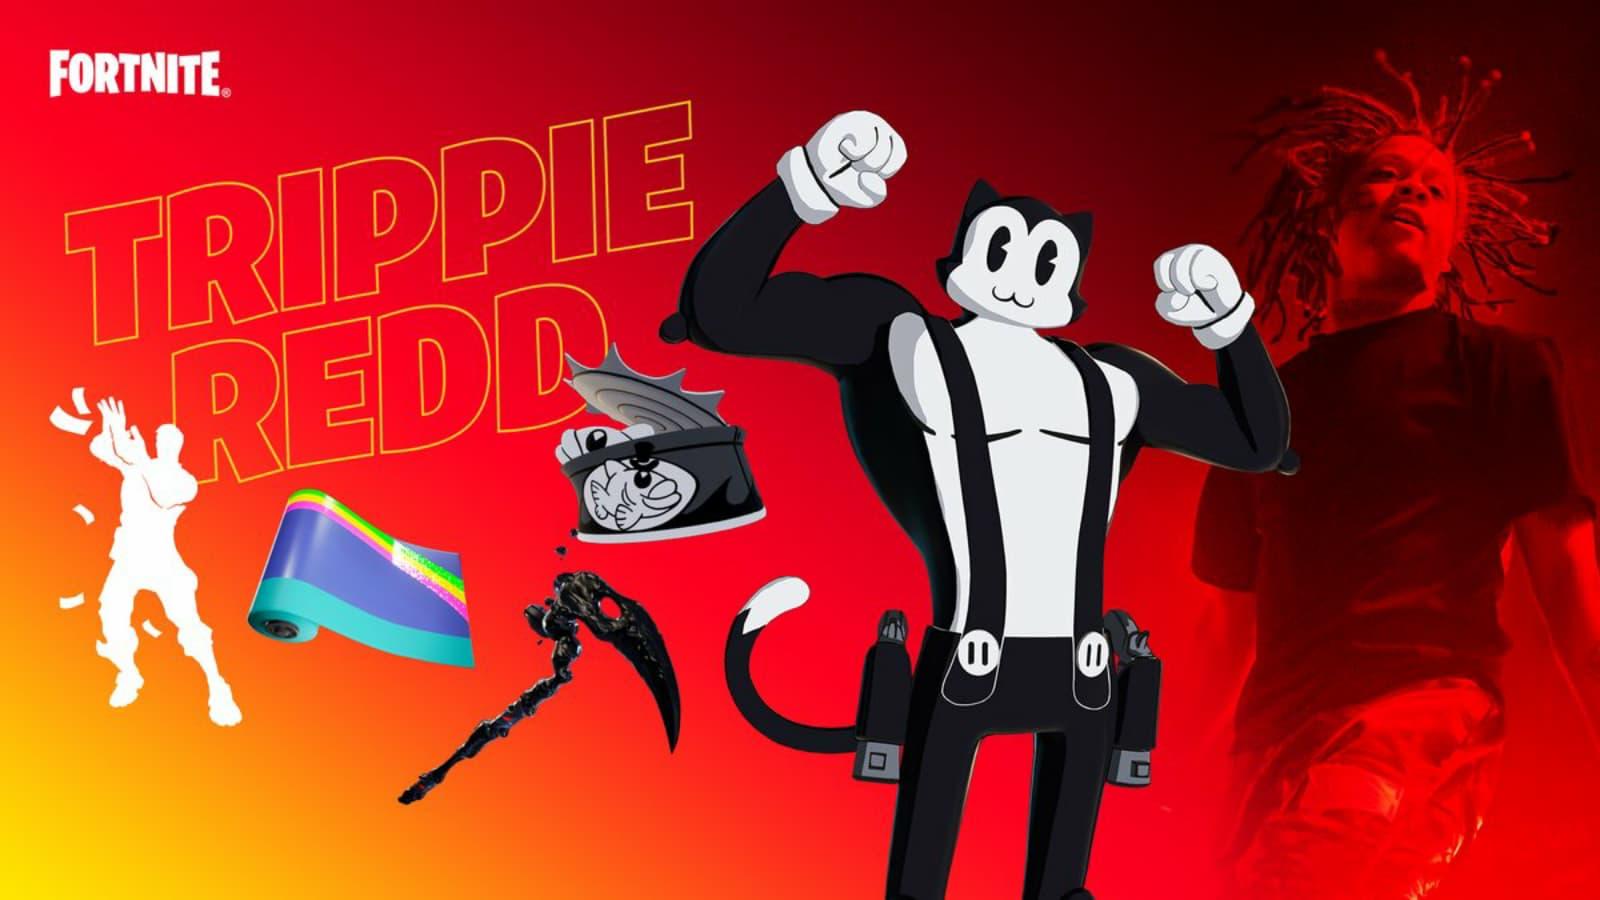 Fortnite Trippie Redd Locker Bundle: How to get in Season 7